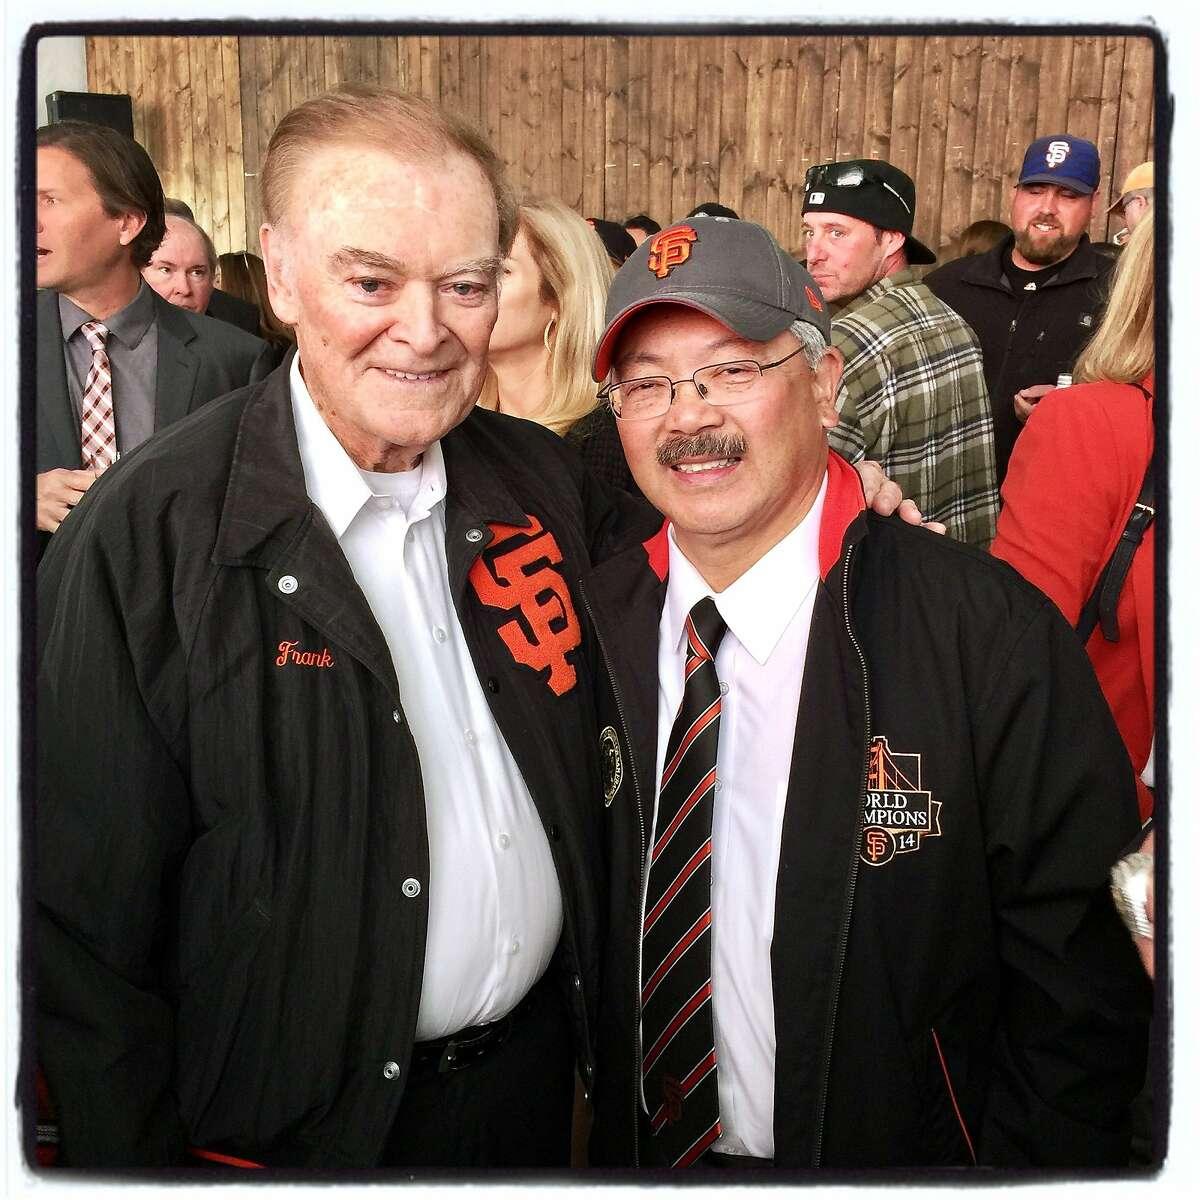 Former Mayor Frank Jordan (left) celebrates Giants opening day with Mayor Ed Lee at the ballpark. April 10, 2017